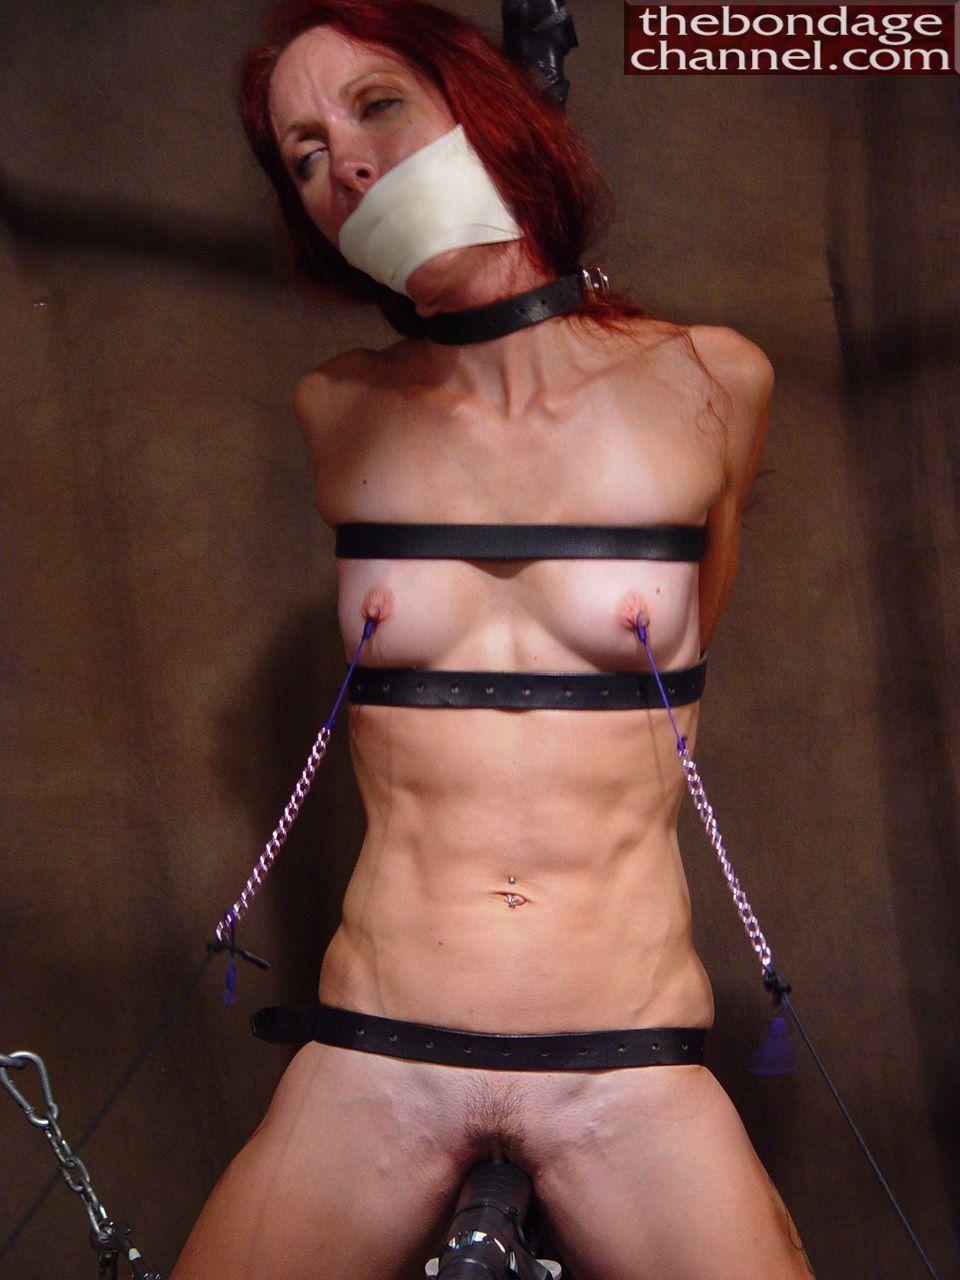 extreme bondage orgasm torture